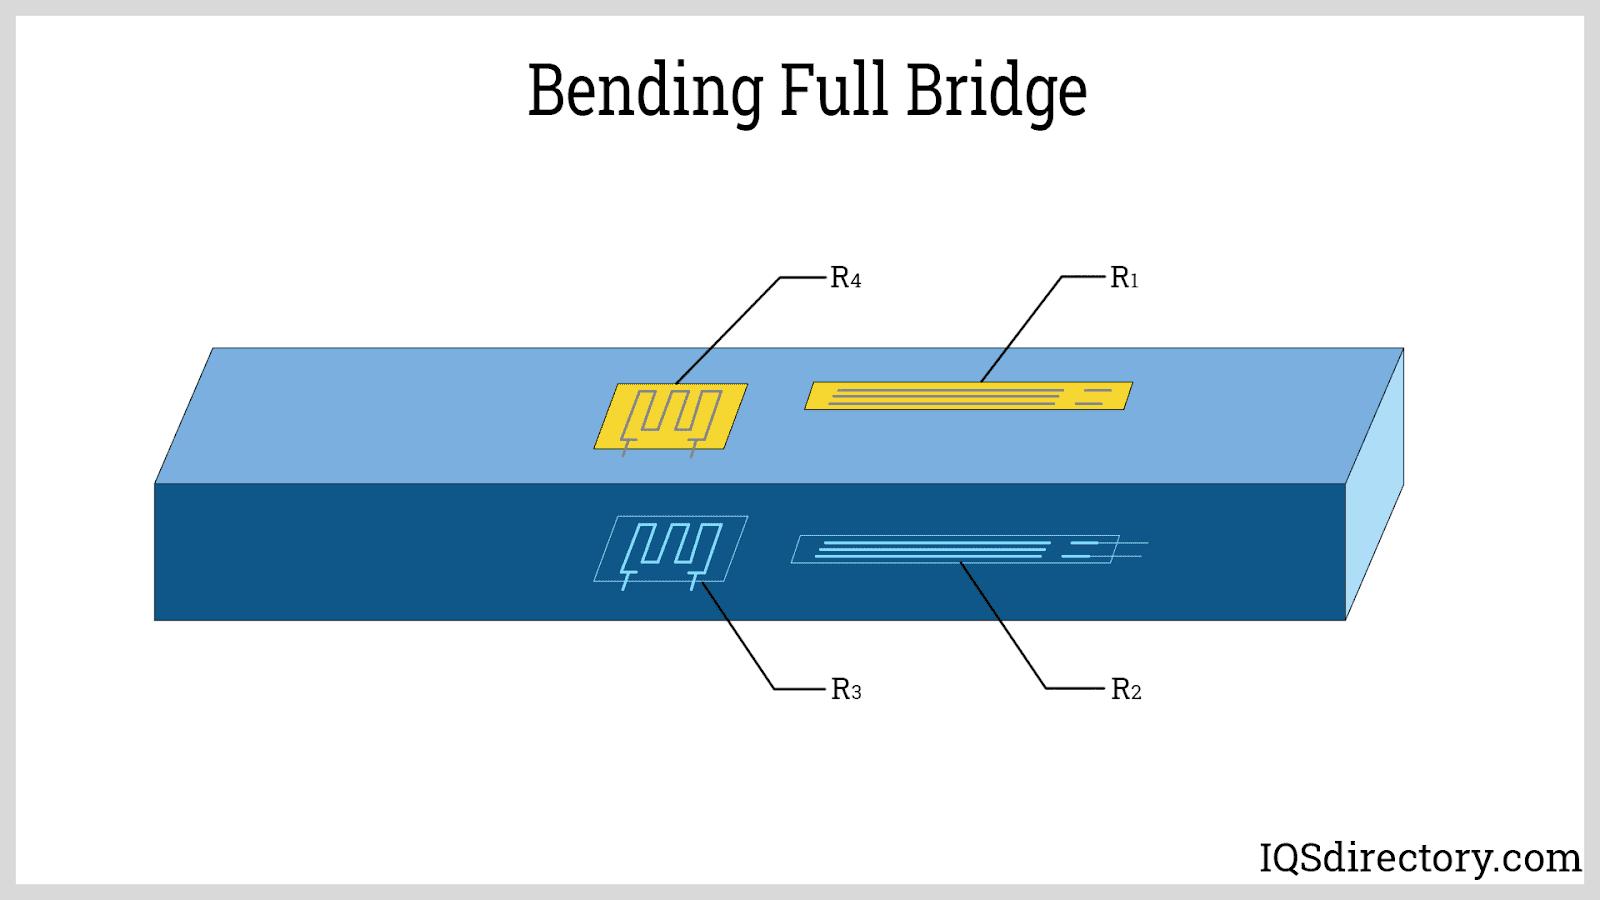 Bending Full Bridge